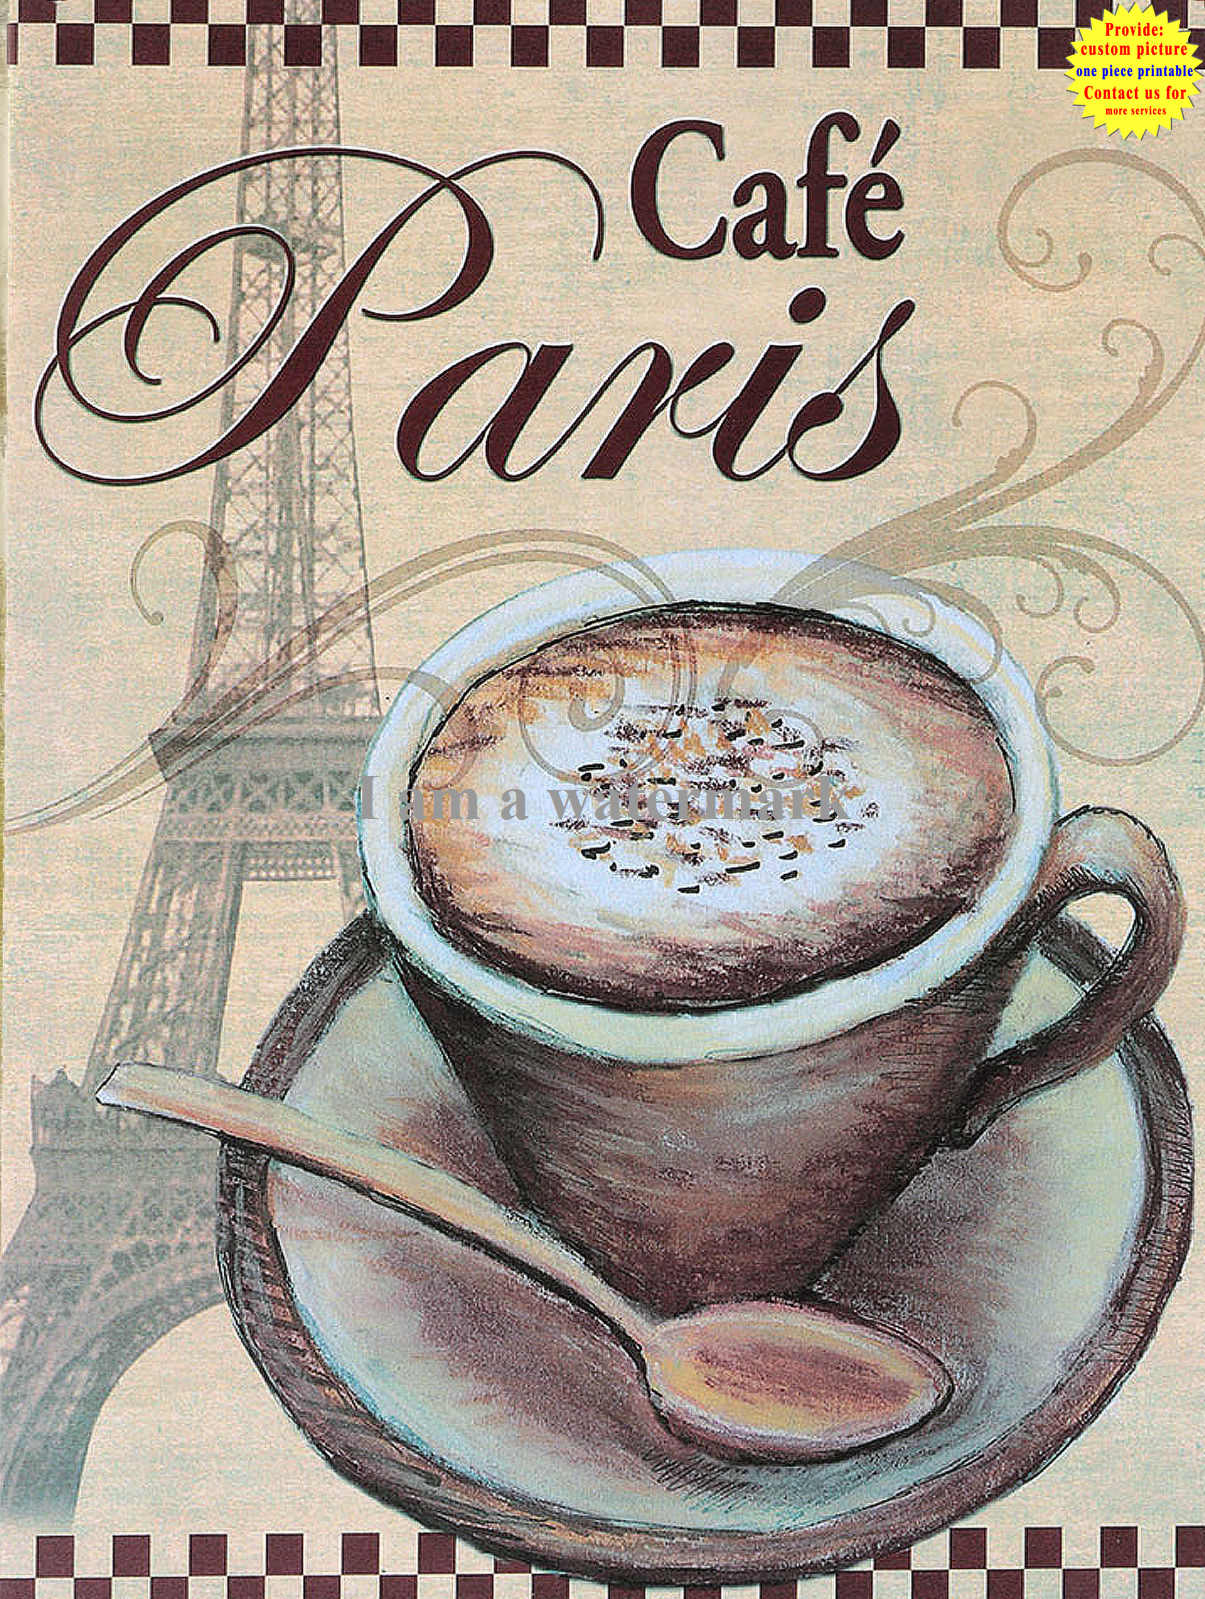 Espresso Retro Metal Tin Signs Plate Tea Poster Cafe Shop Art Wall Decor